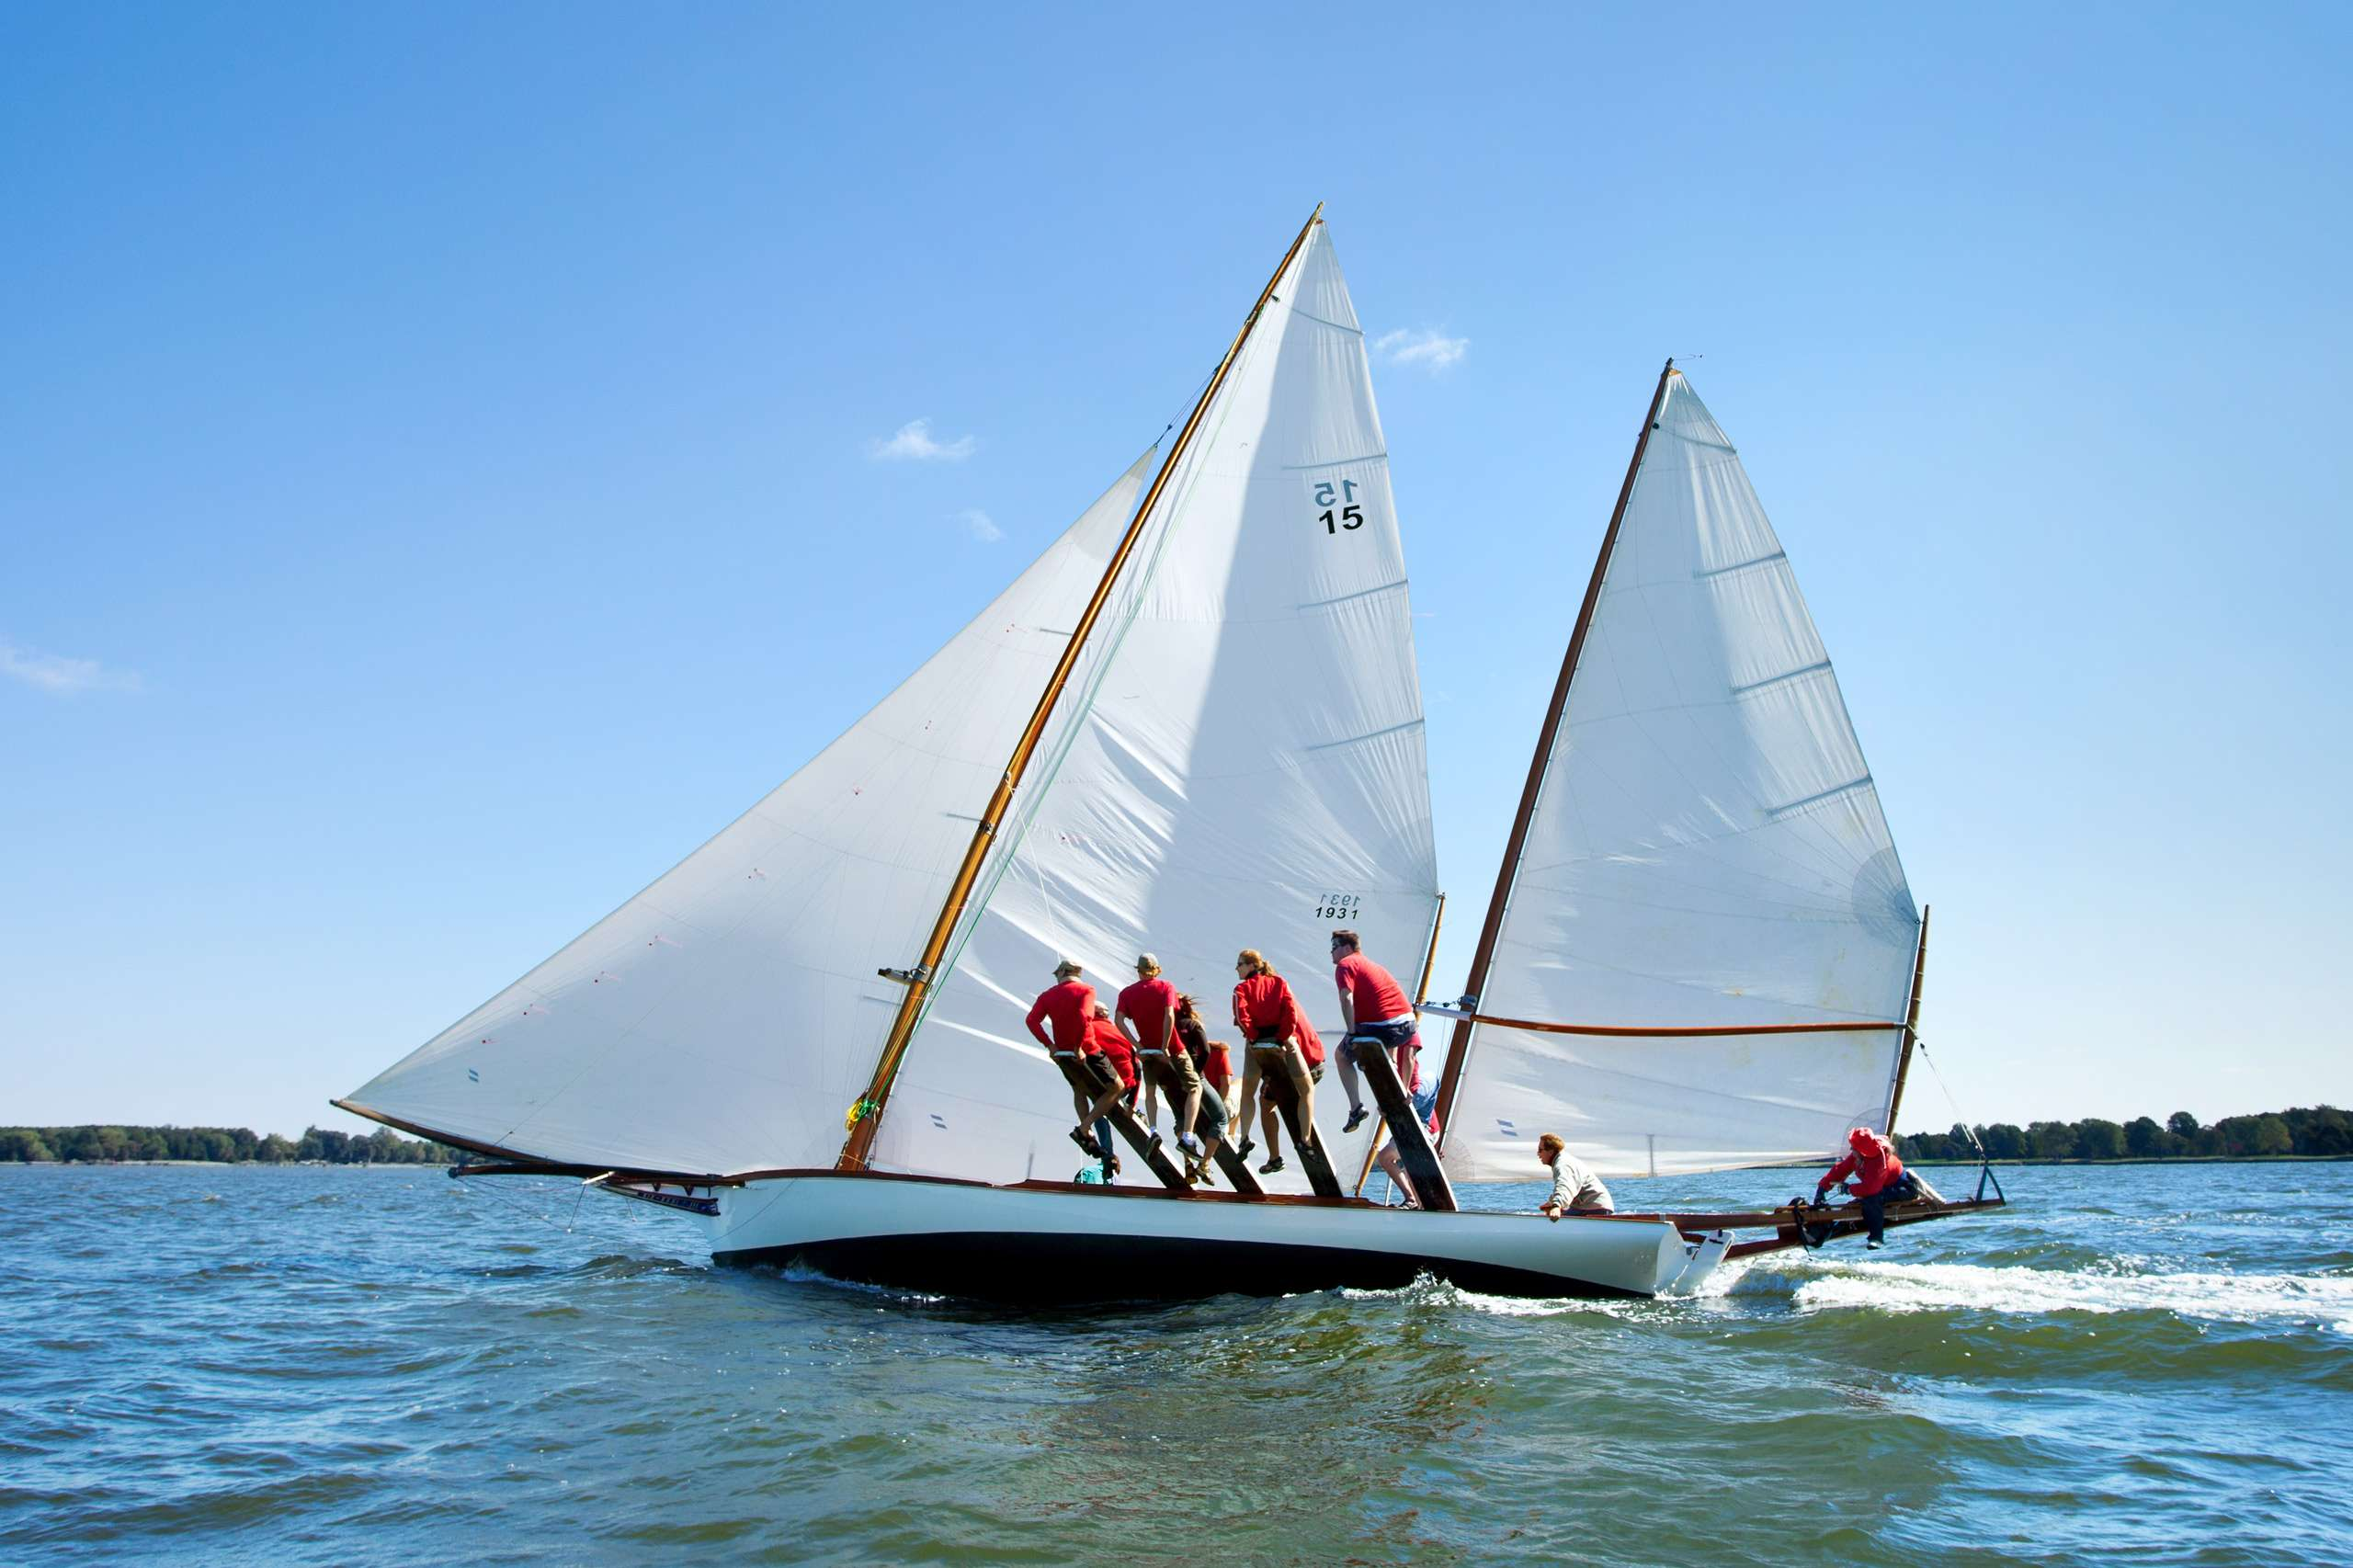 PORTFOLIO - Sailing - Log Canoes #10   PCG556